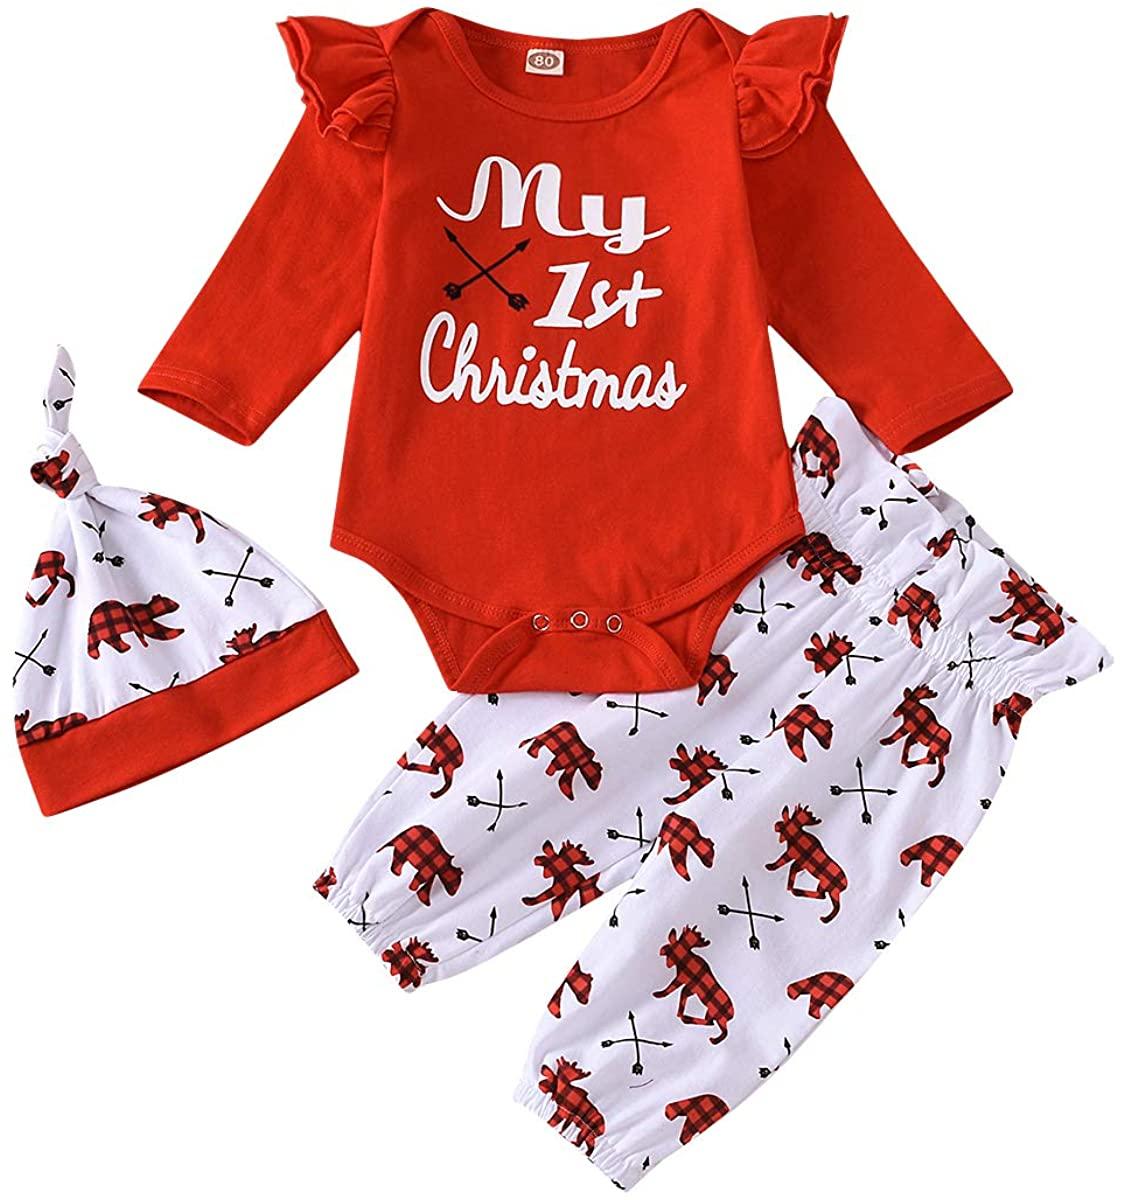 My First Christmas Outfit Newborn Baby Boy Girl Long Sleeve Romper Top+Bear Plaid Pants+Hat/Headband 3PCS Clothes Set